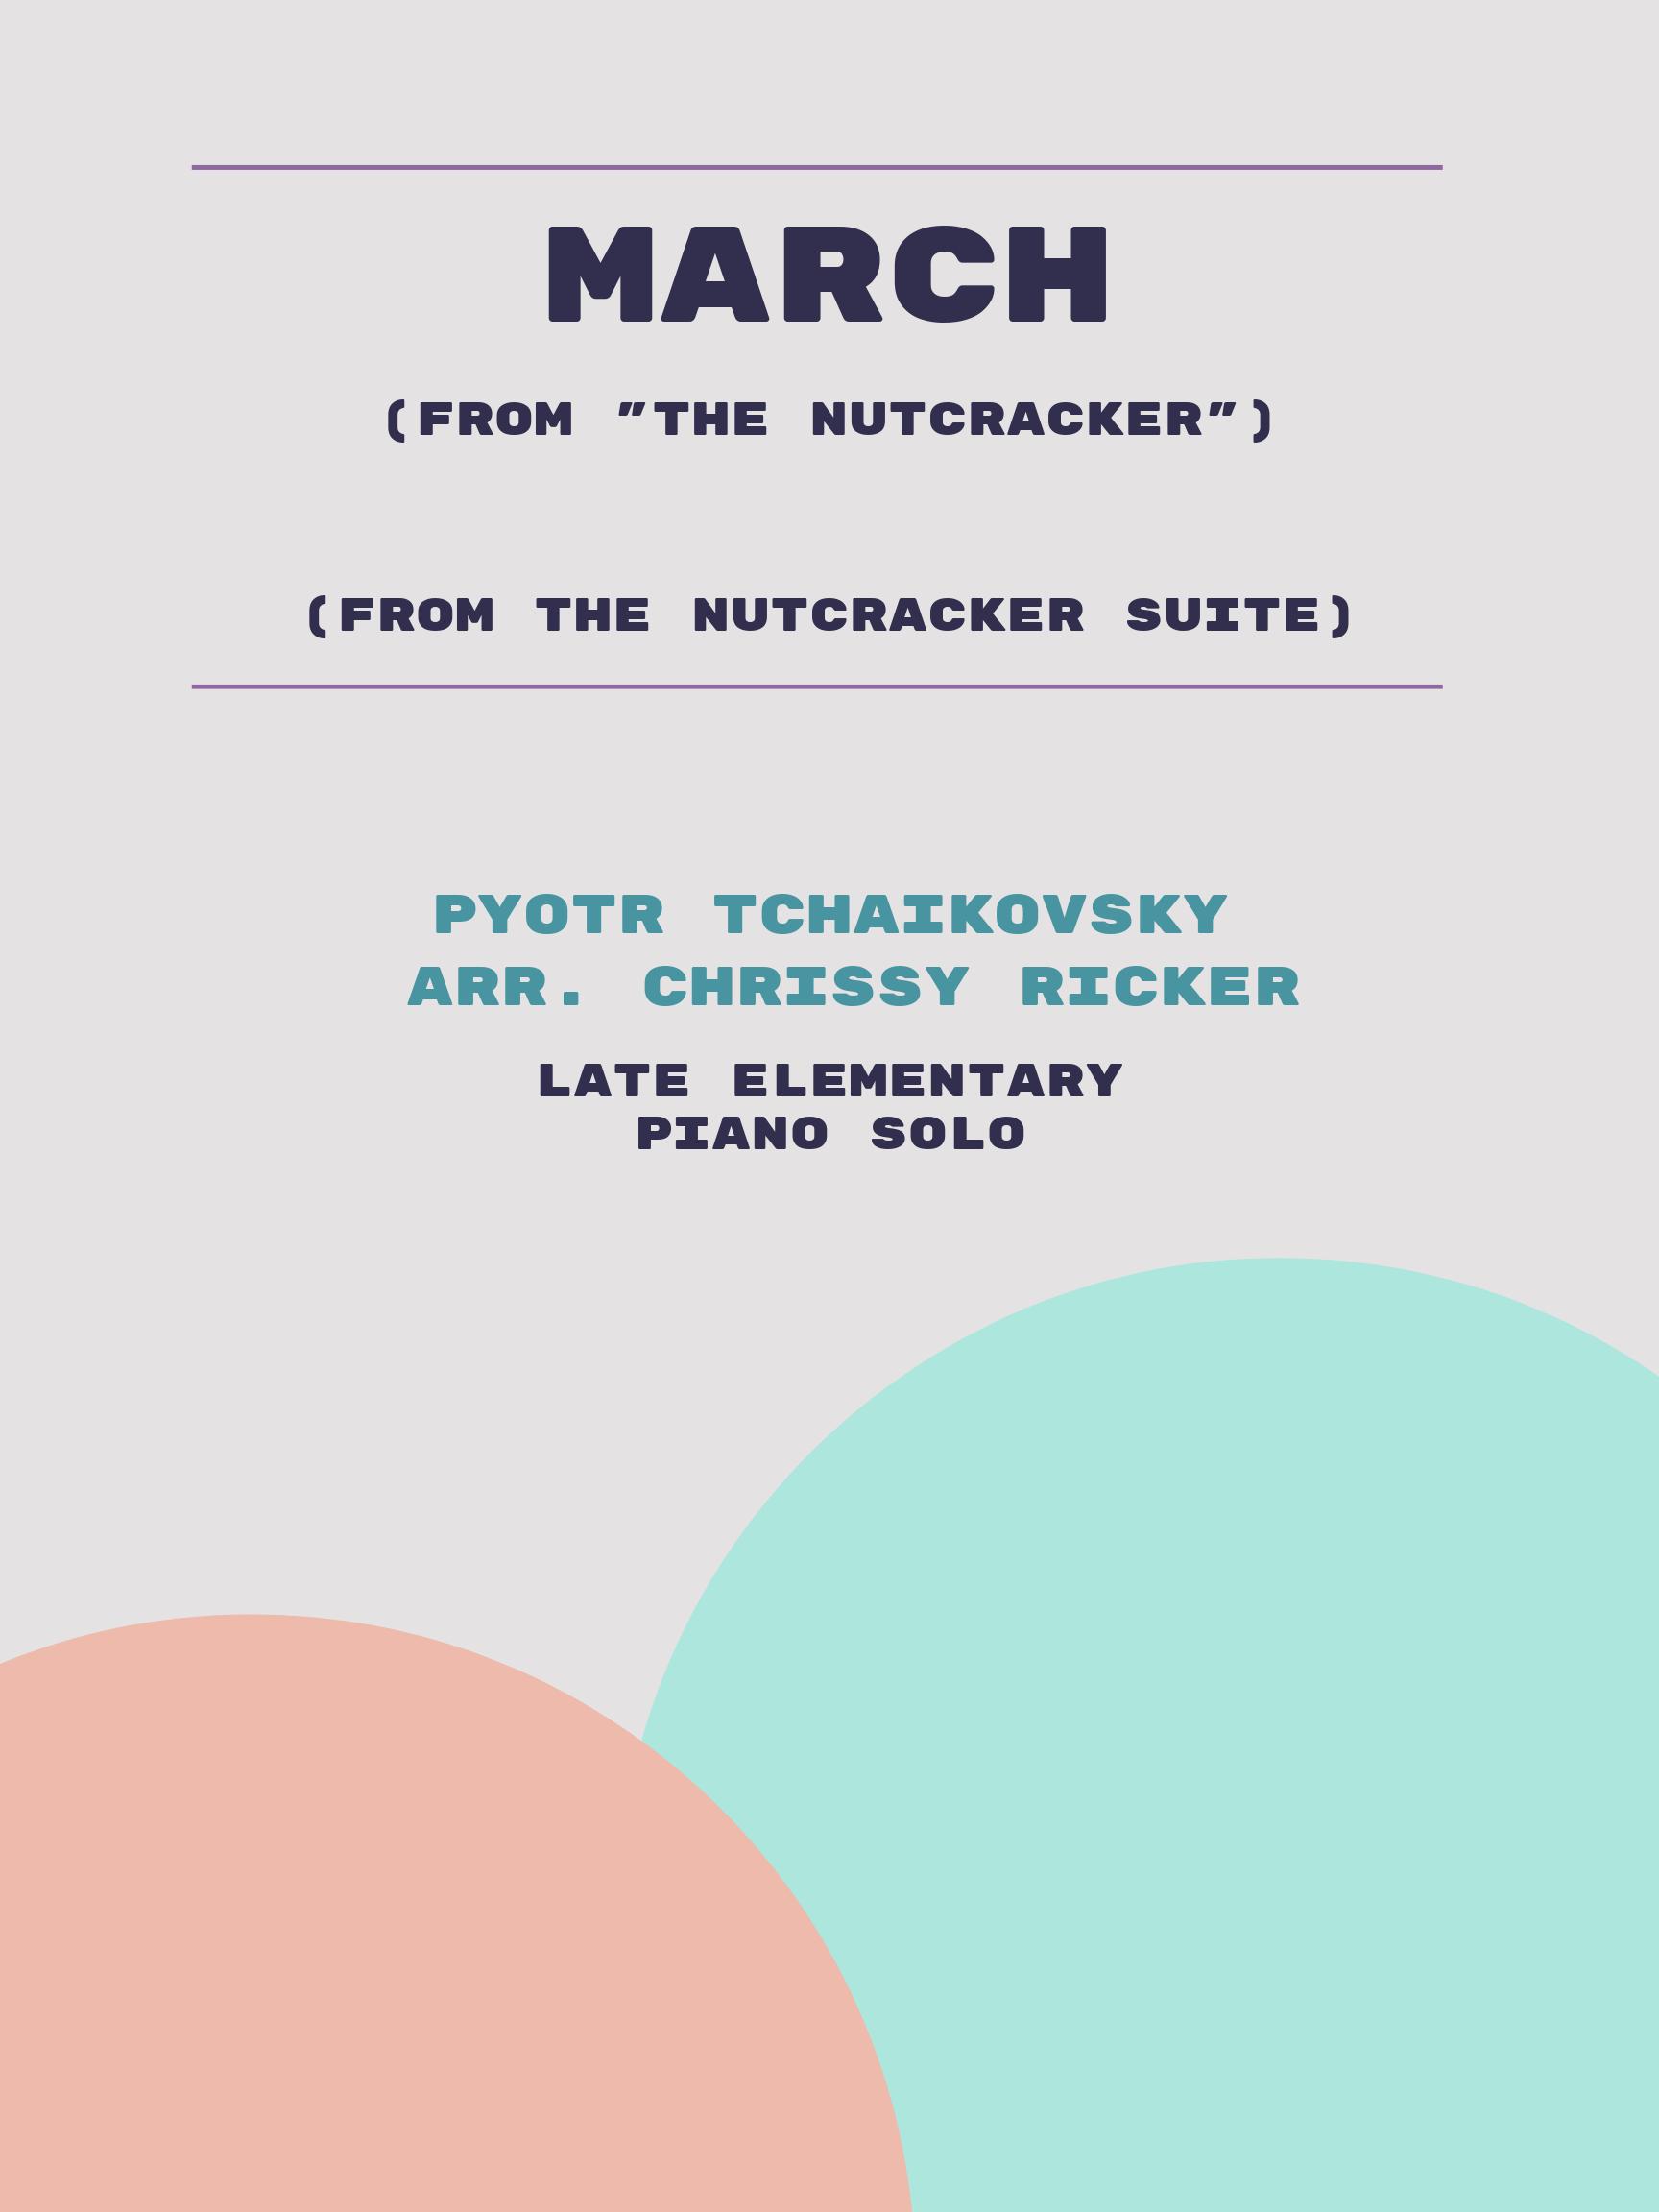 March by Pyotr Tchaikovsky